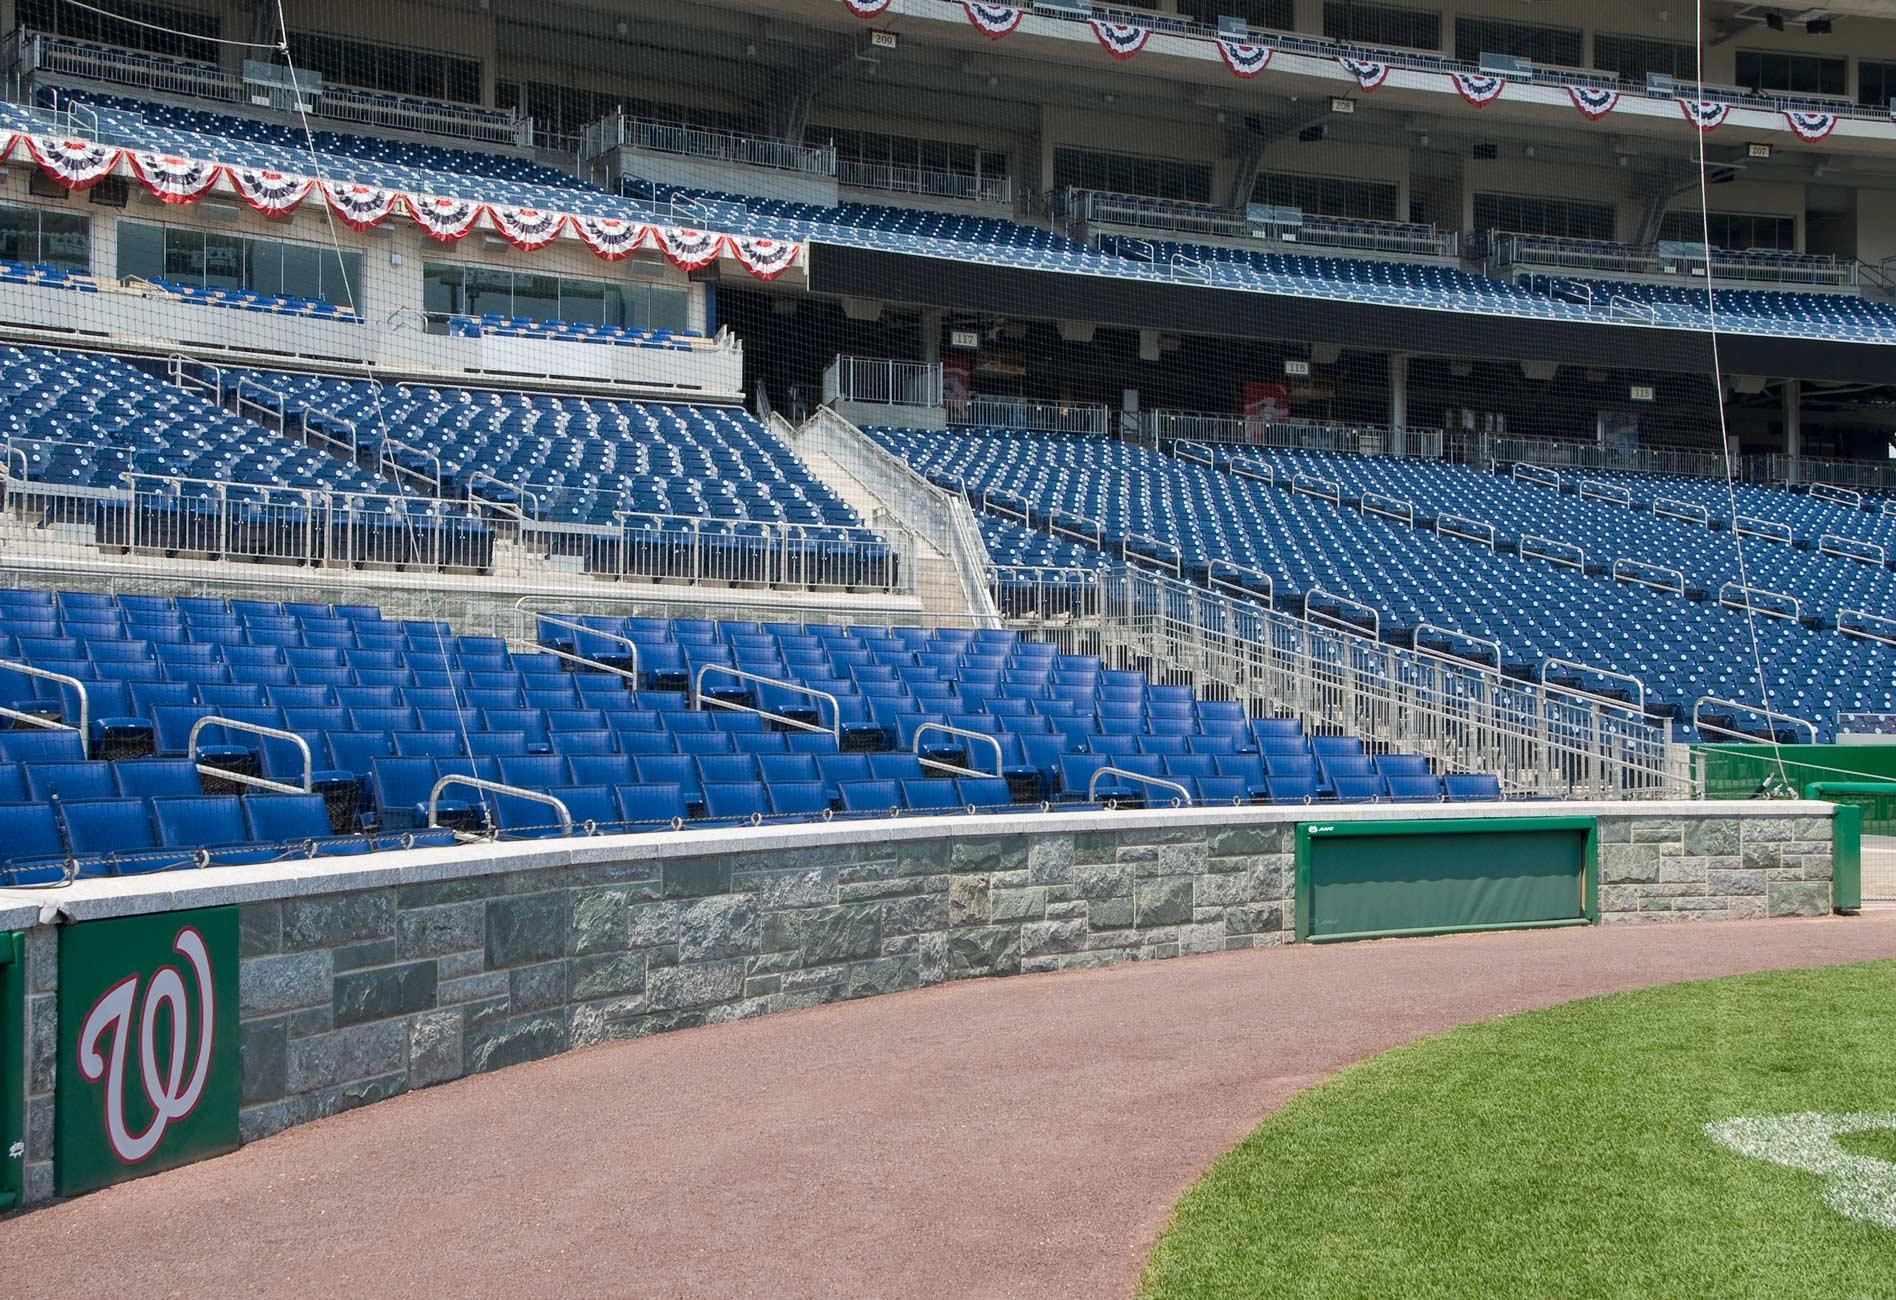 Nationals-Ballpark-2.jpg